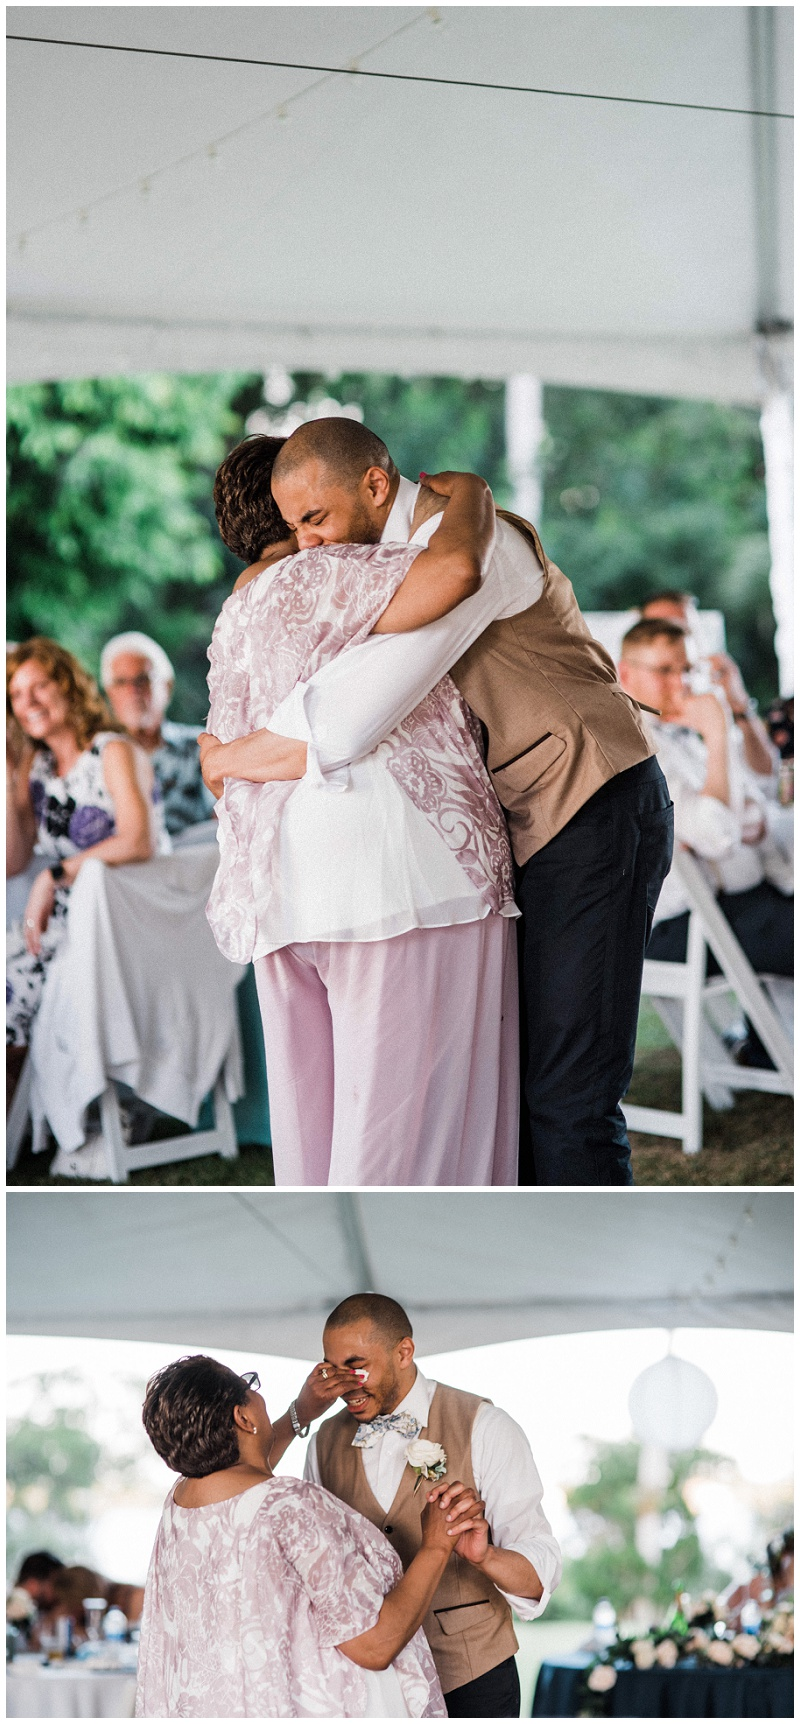 dayton wedding photography_ chelsea hall photography_krysten and matthew_siesta key wedding_0122.jpg